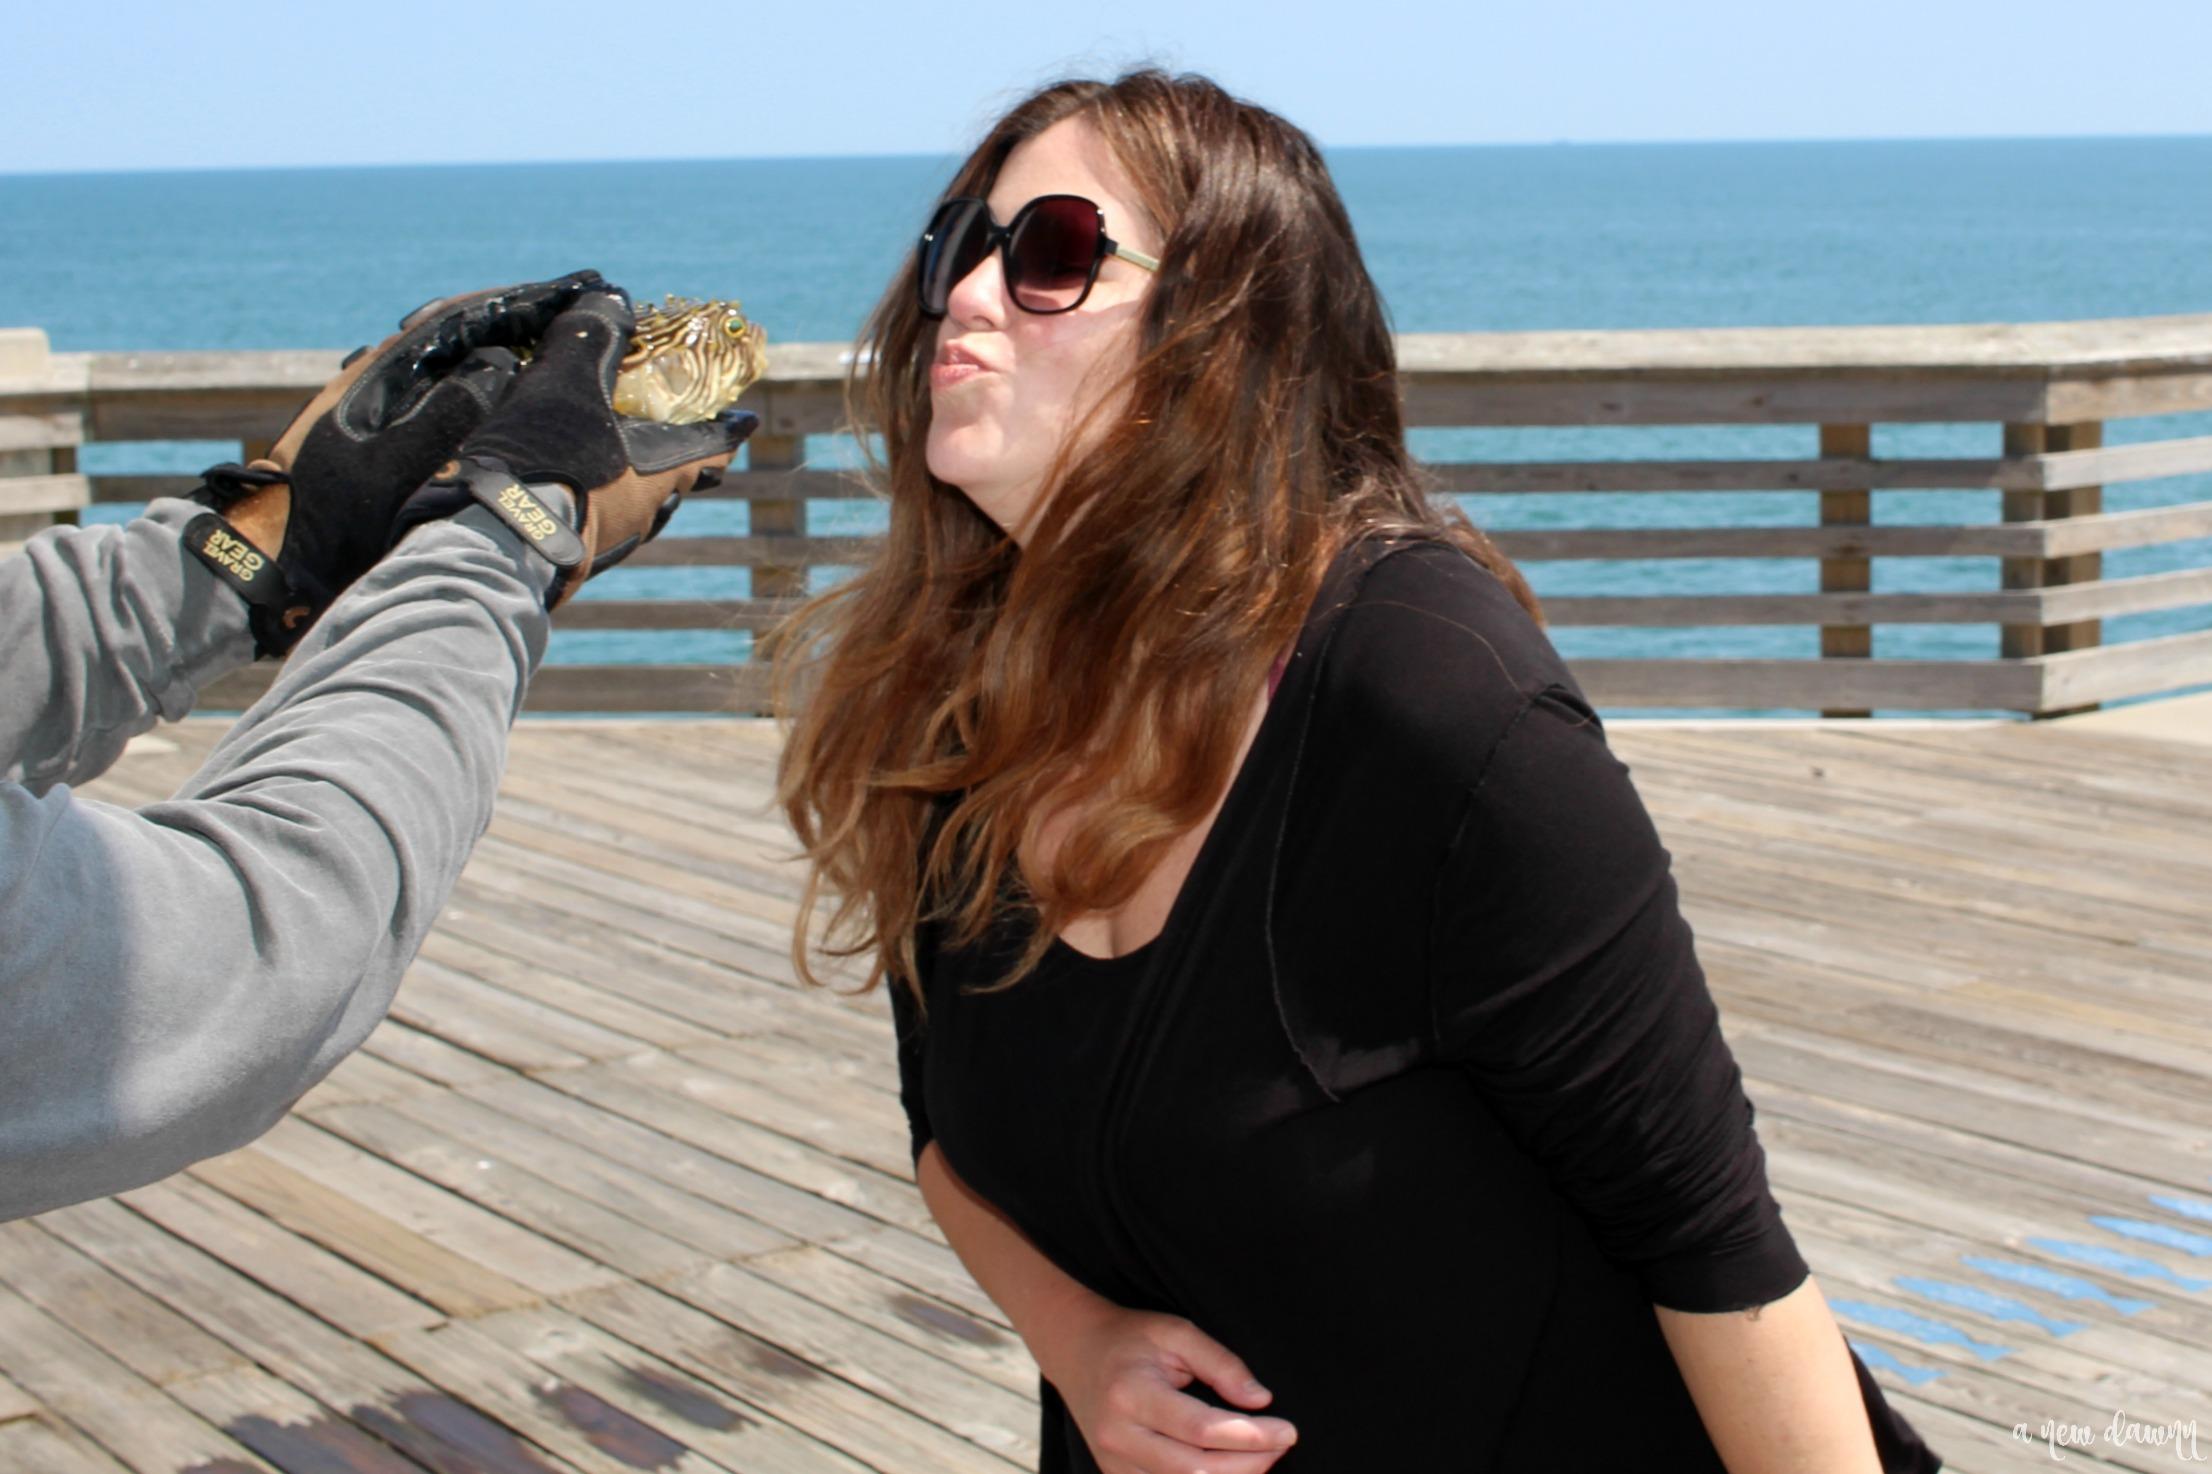 Woman looking at a fish in Nags Head, NC